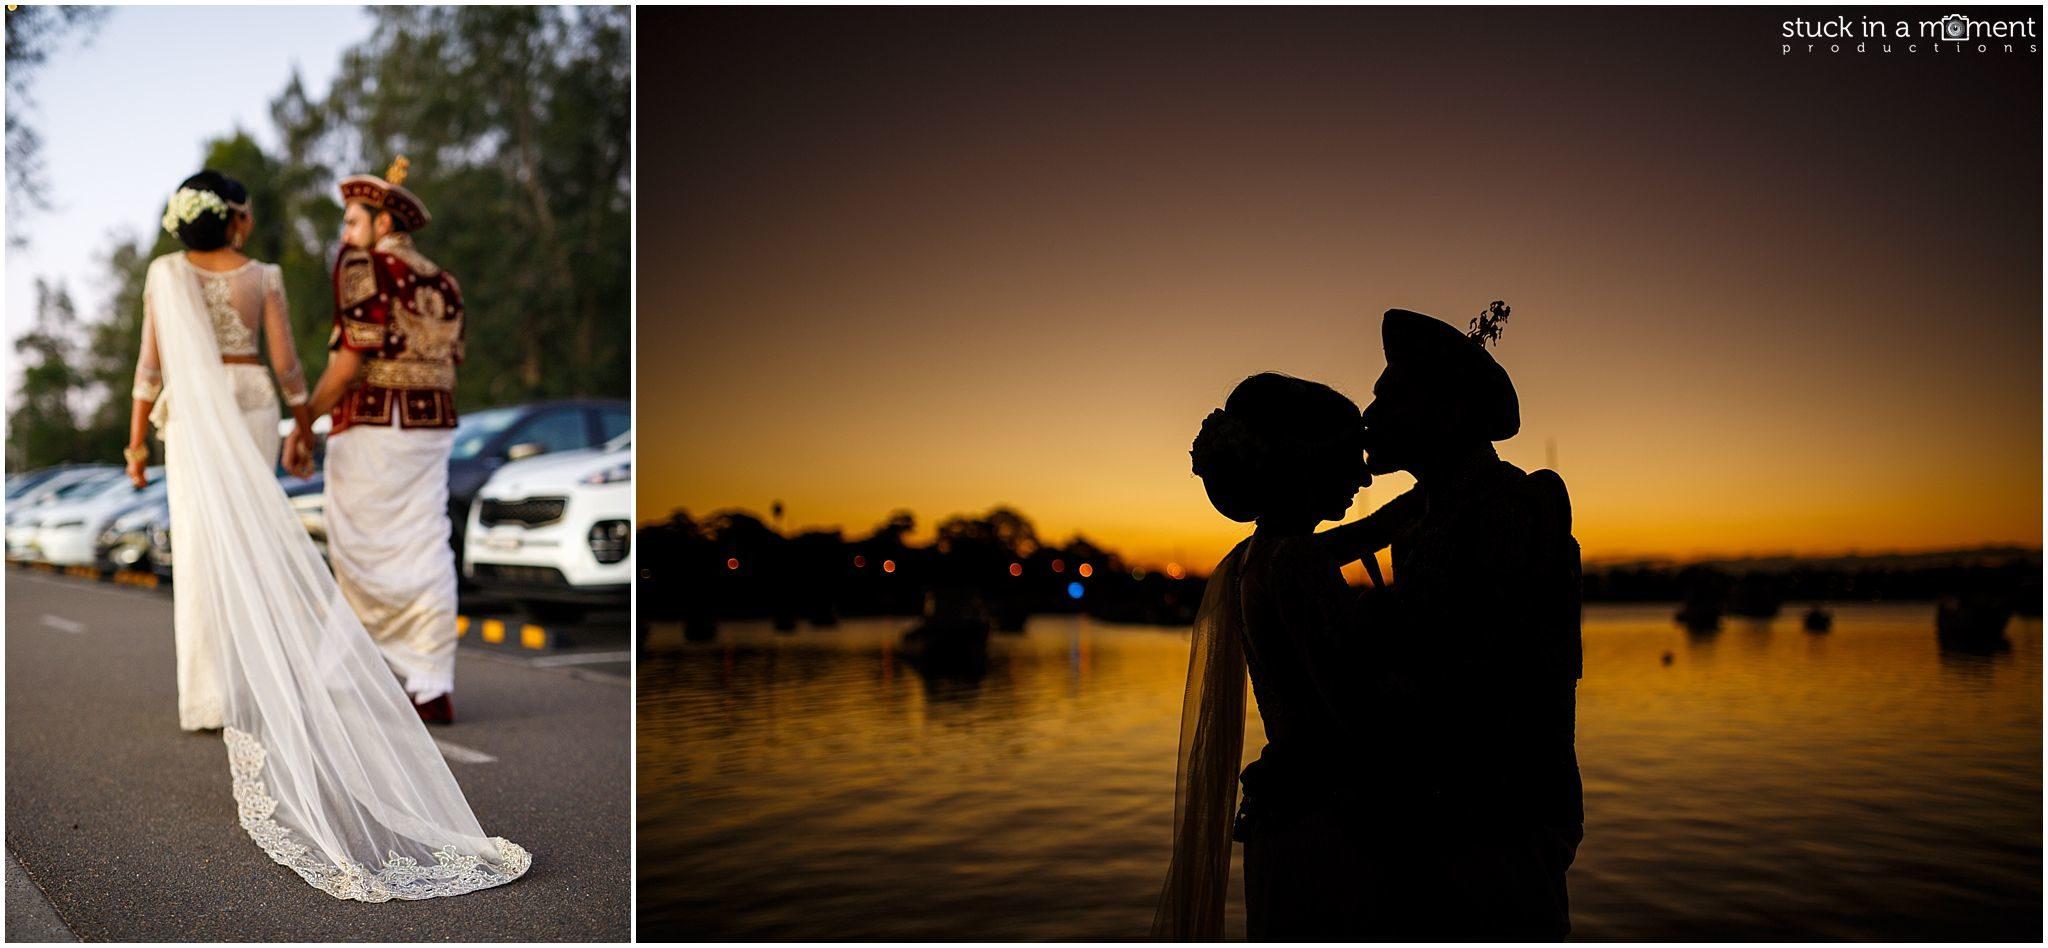 sydney poruwa ceremony photographer videographer